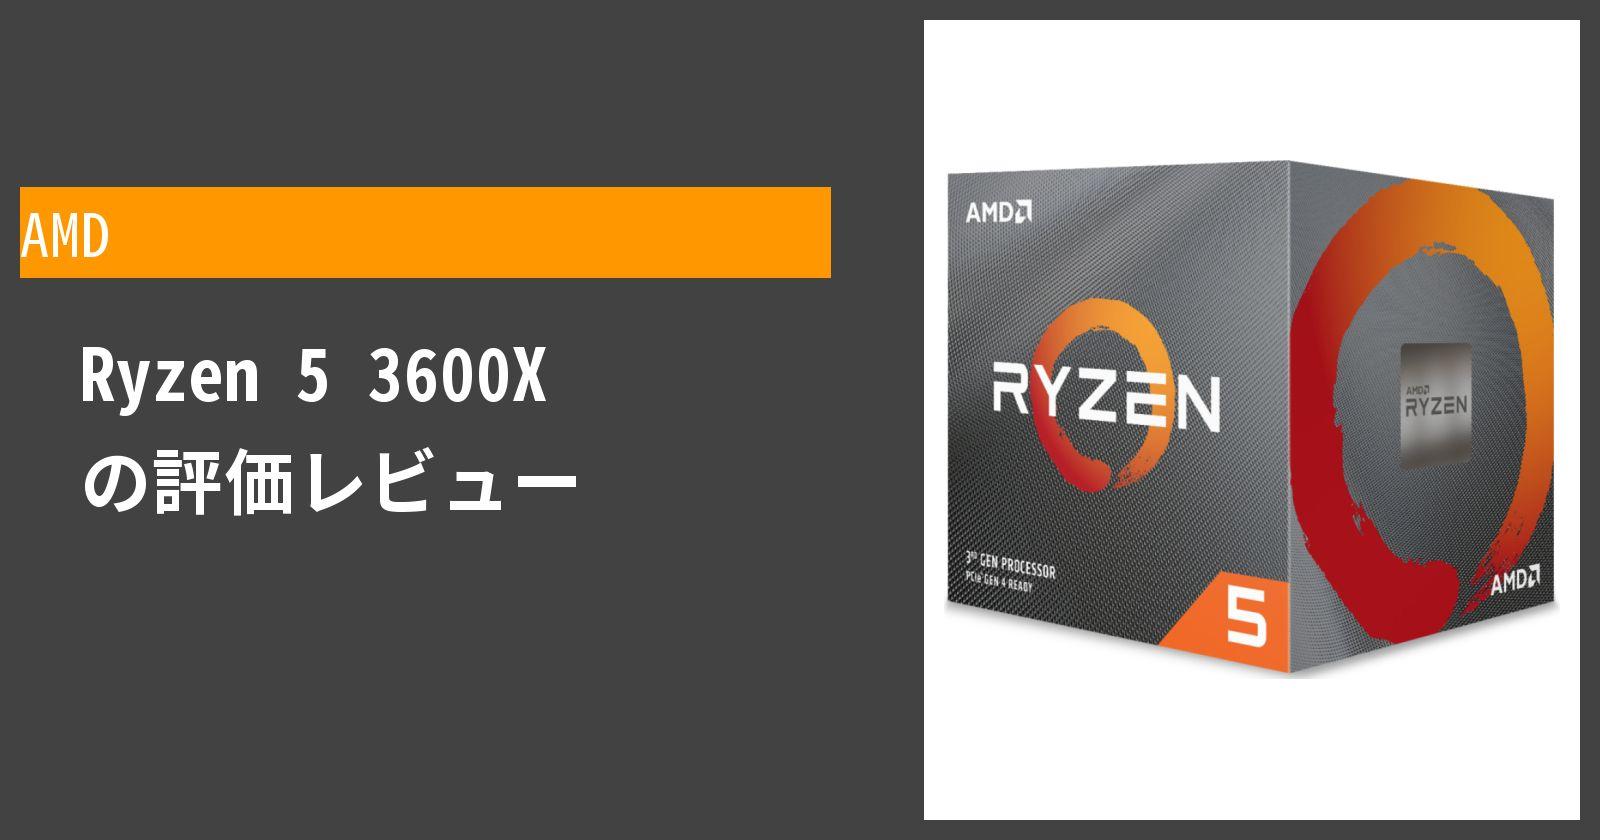 Ryzen 5 3600Xを徹底評価